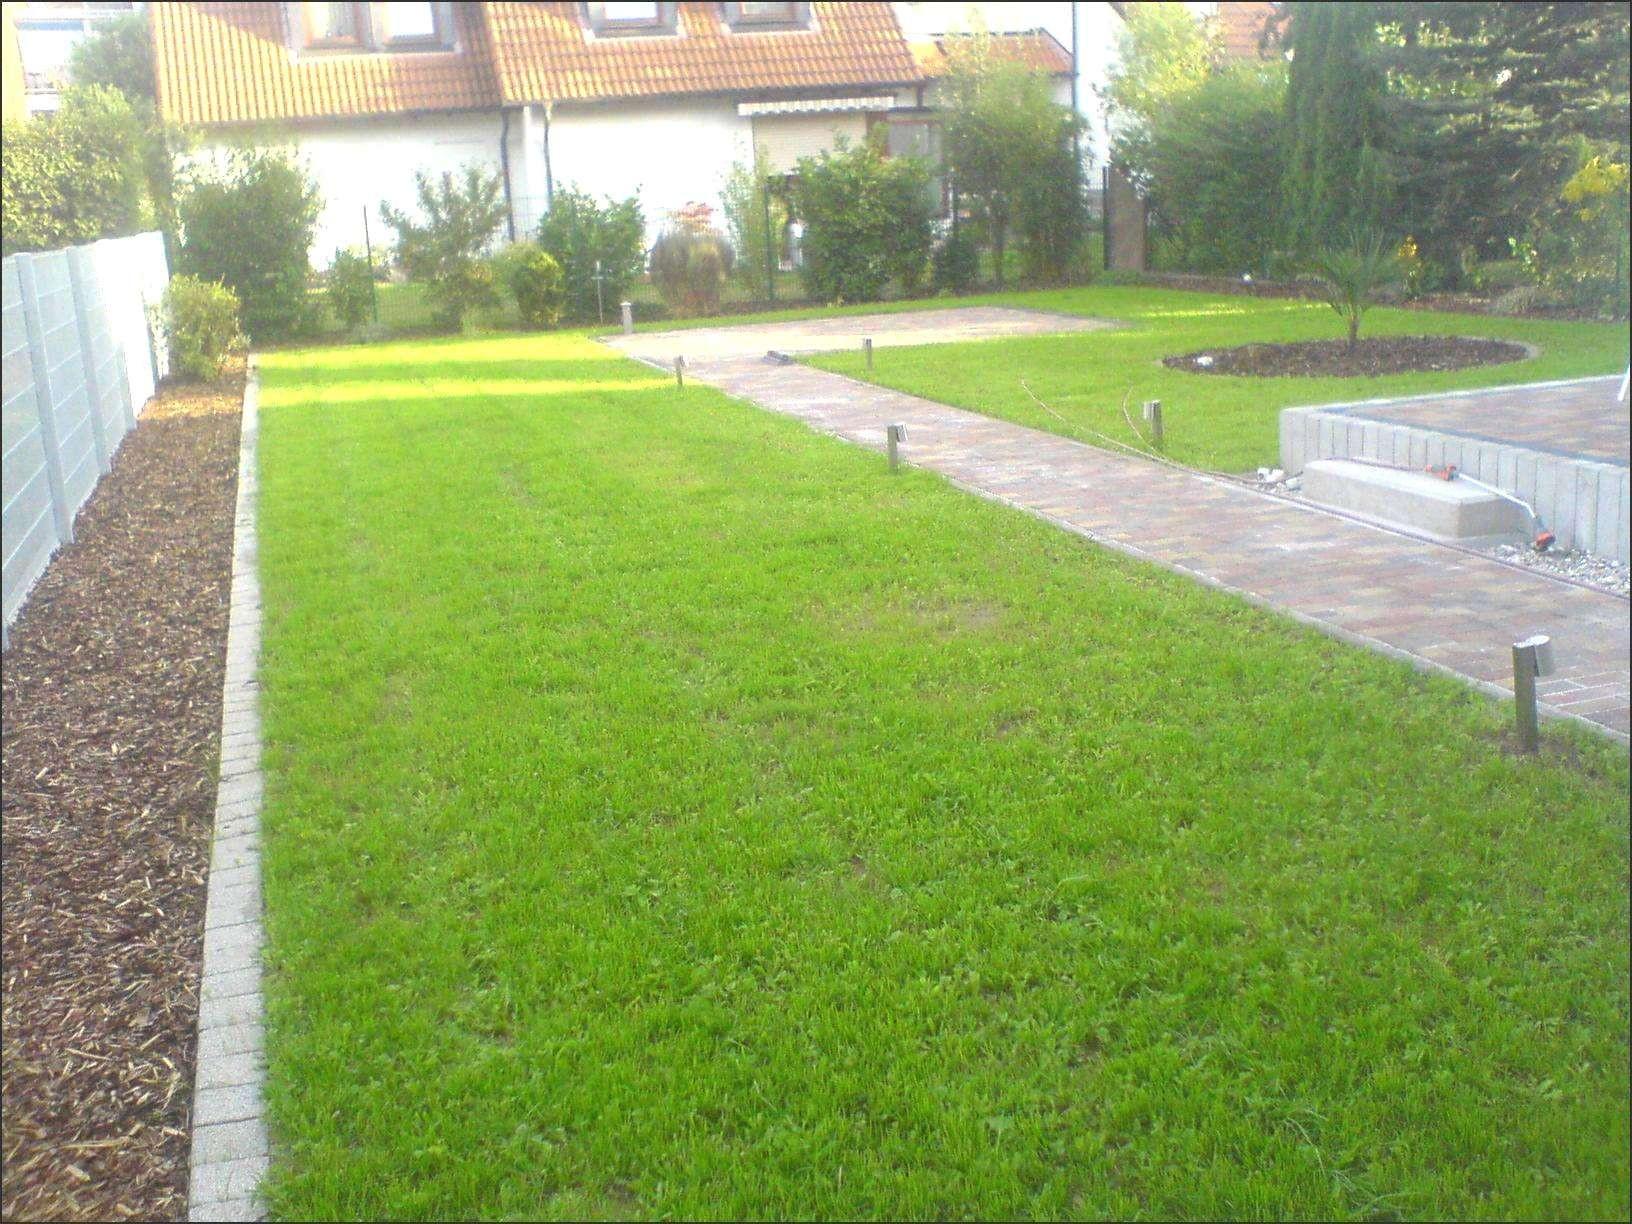 Garten Terrasse Anlegen Best Of Garten Mit Blumen Gestalten Garten Gestalten Mit Wenig Geld